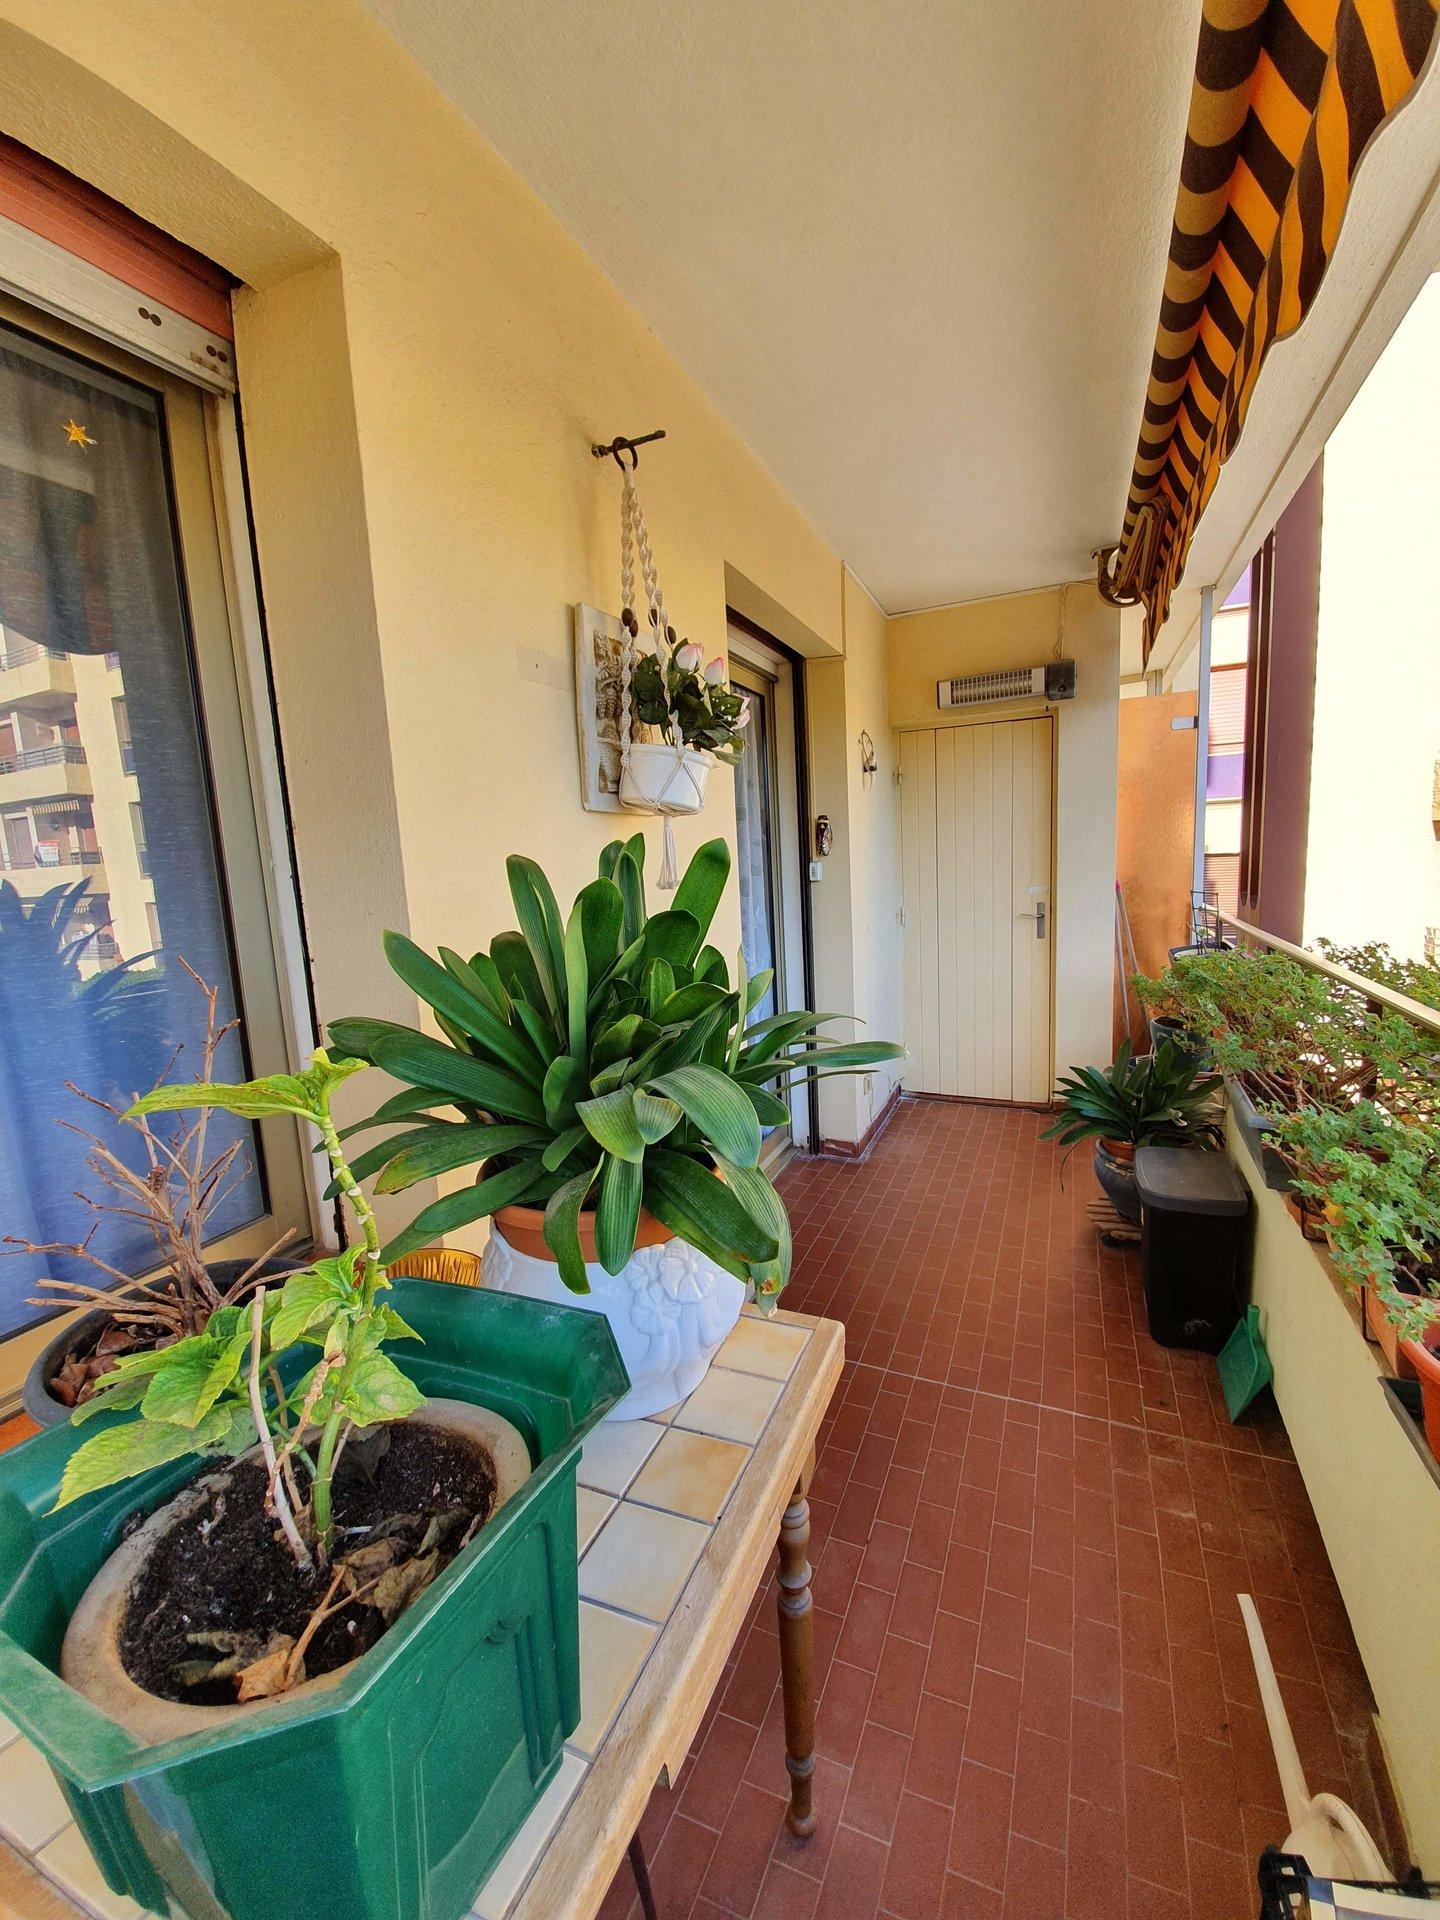 Appartement T4 PLEIN CENTRE CALME